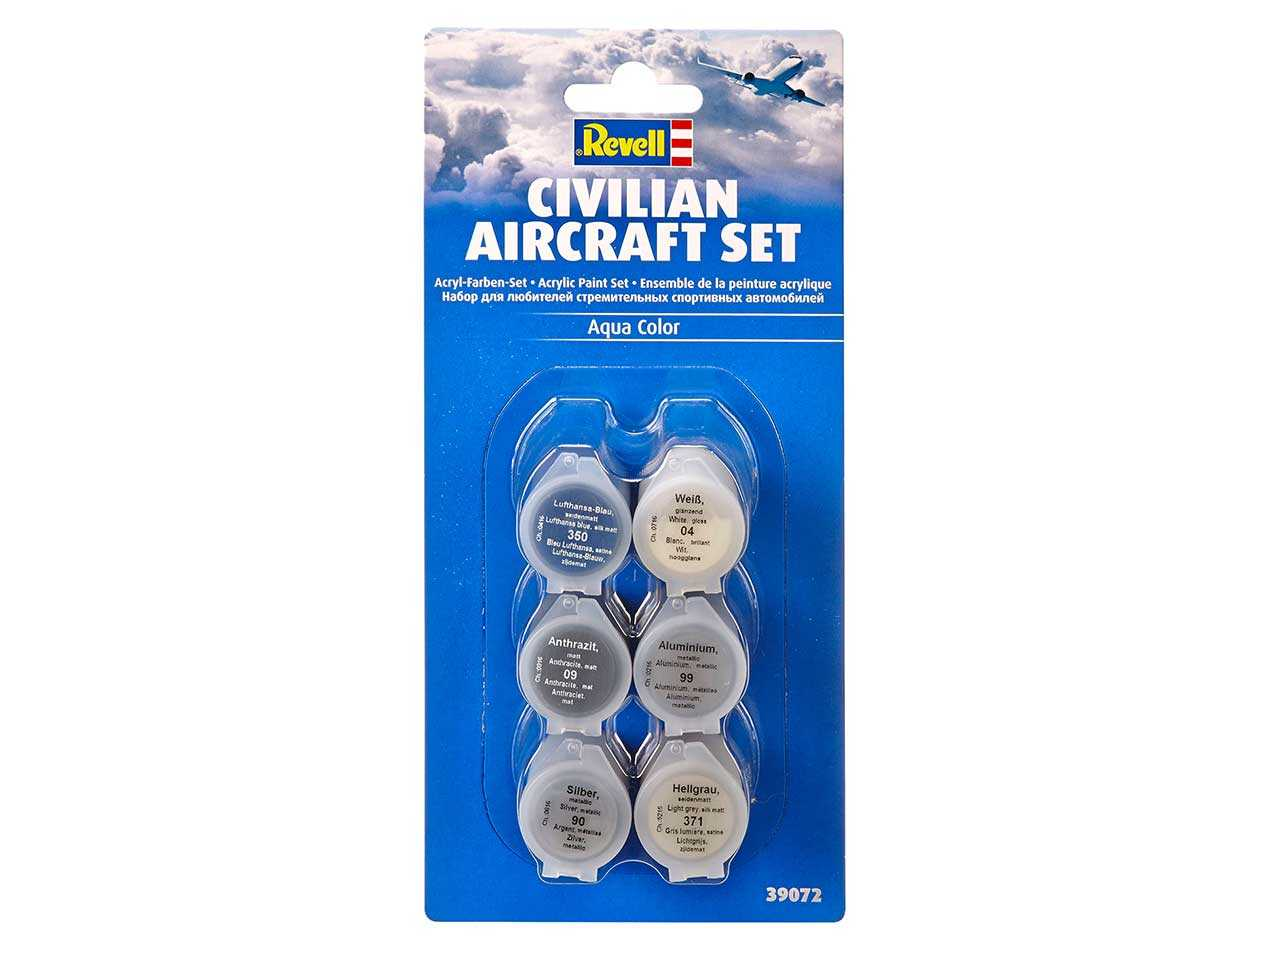 Sada barev Aqua Color 39072 - Civilian Aircraft Set